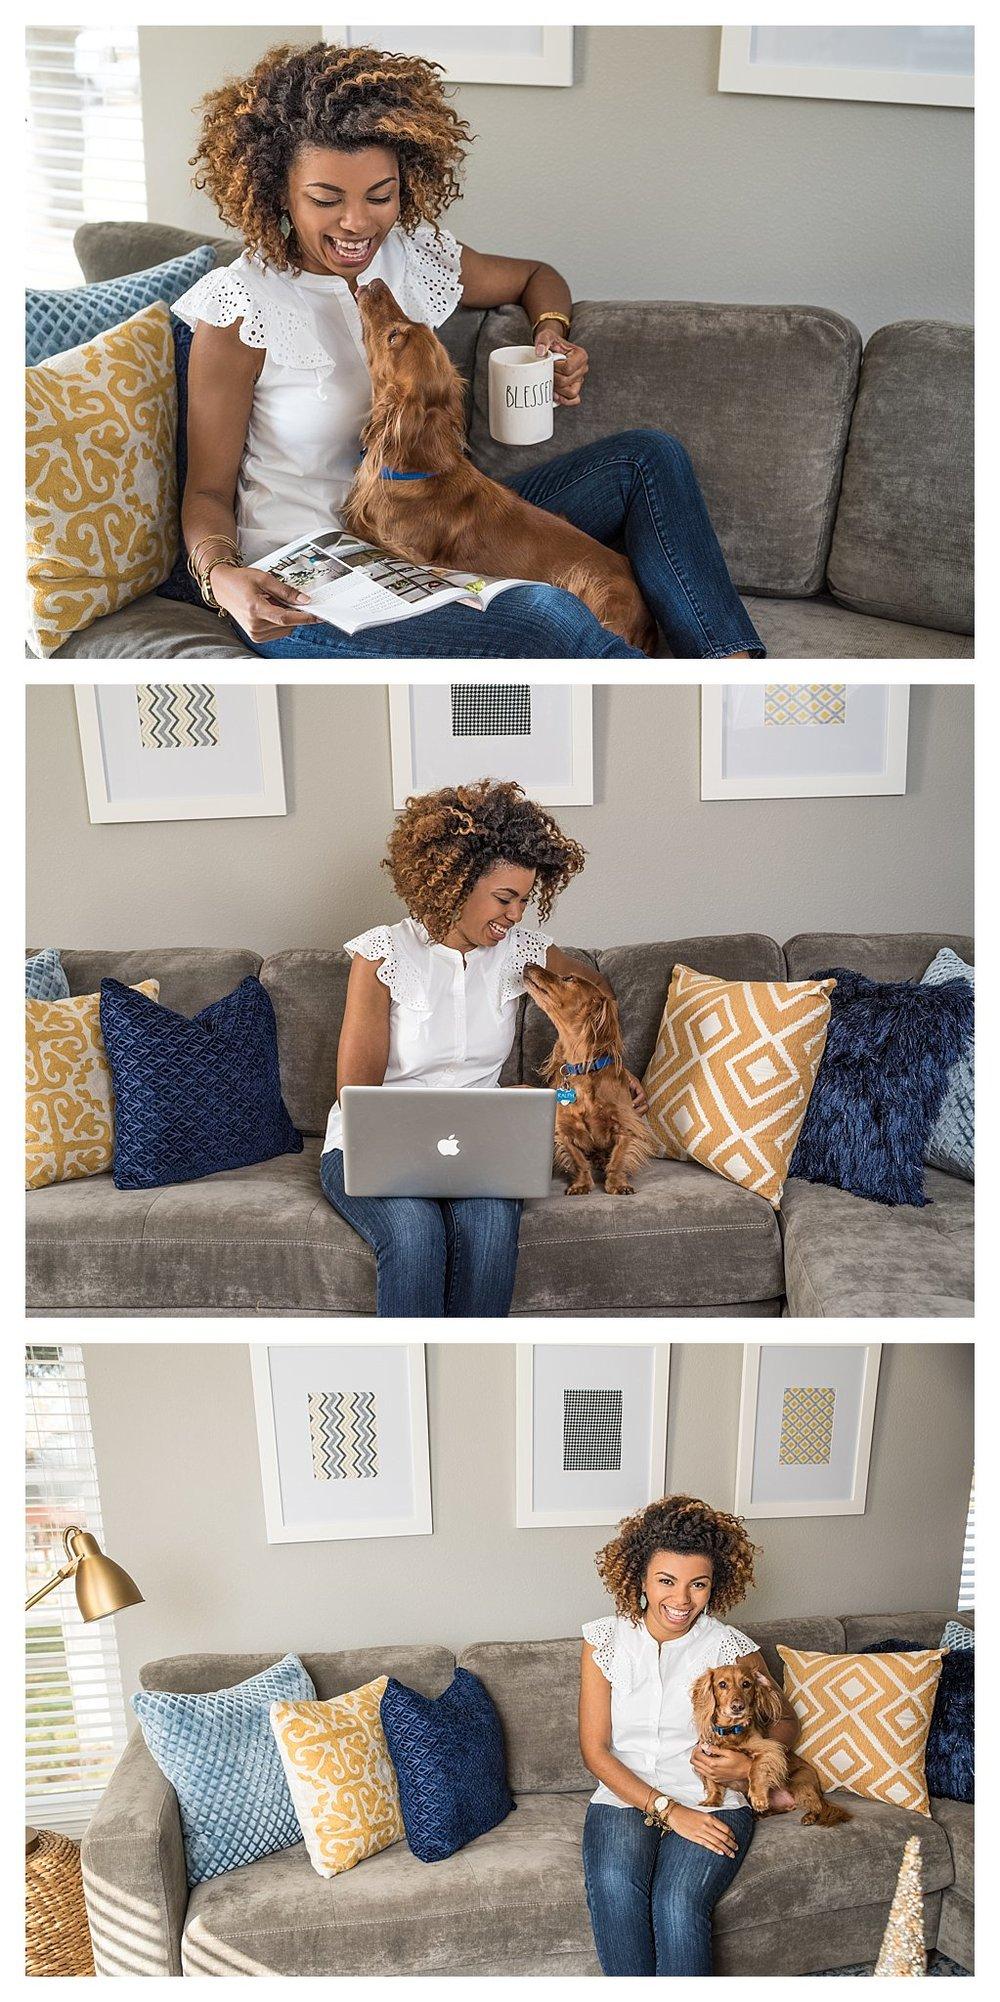 decorating-secrets-for-your-home-san-antonio-photographer-headshots-business-photos.jpg